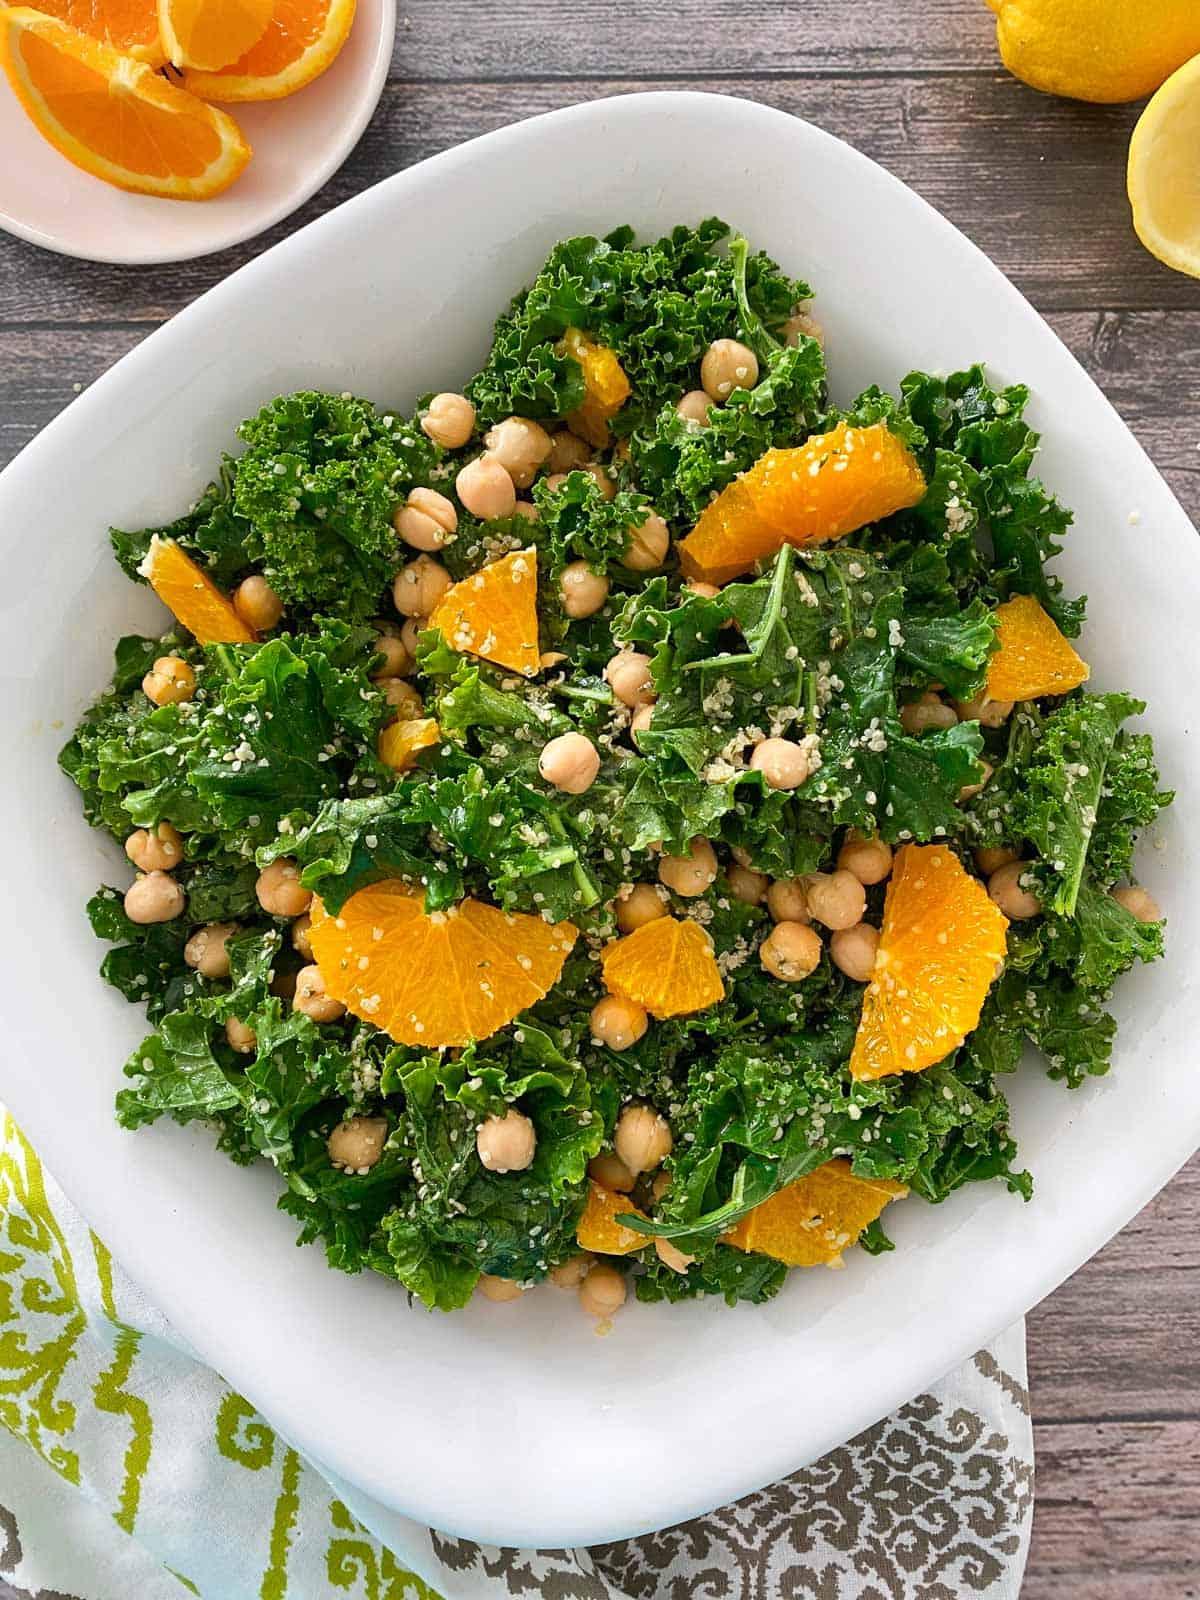 Large white bowl with kale salad, garnished with oranges.